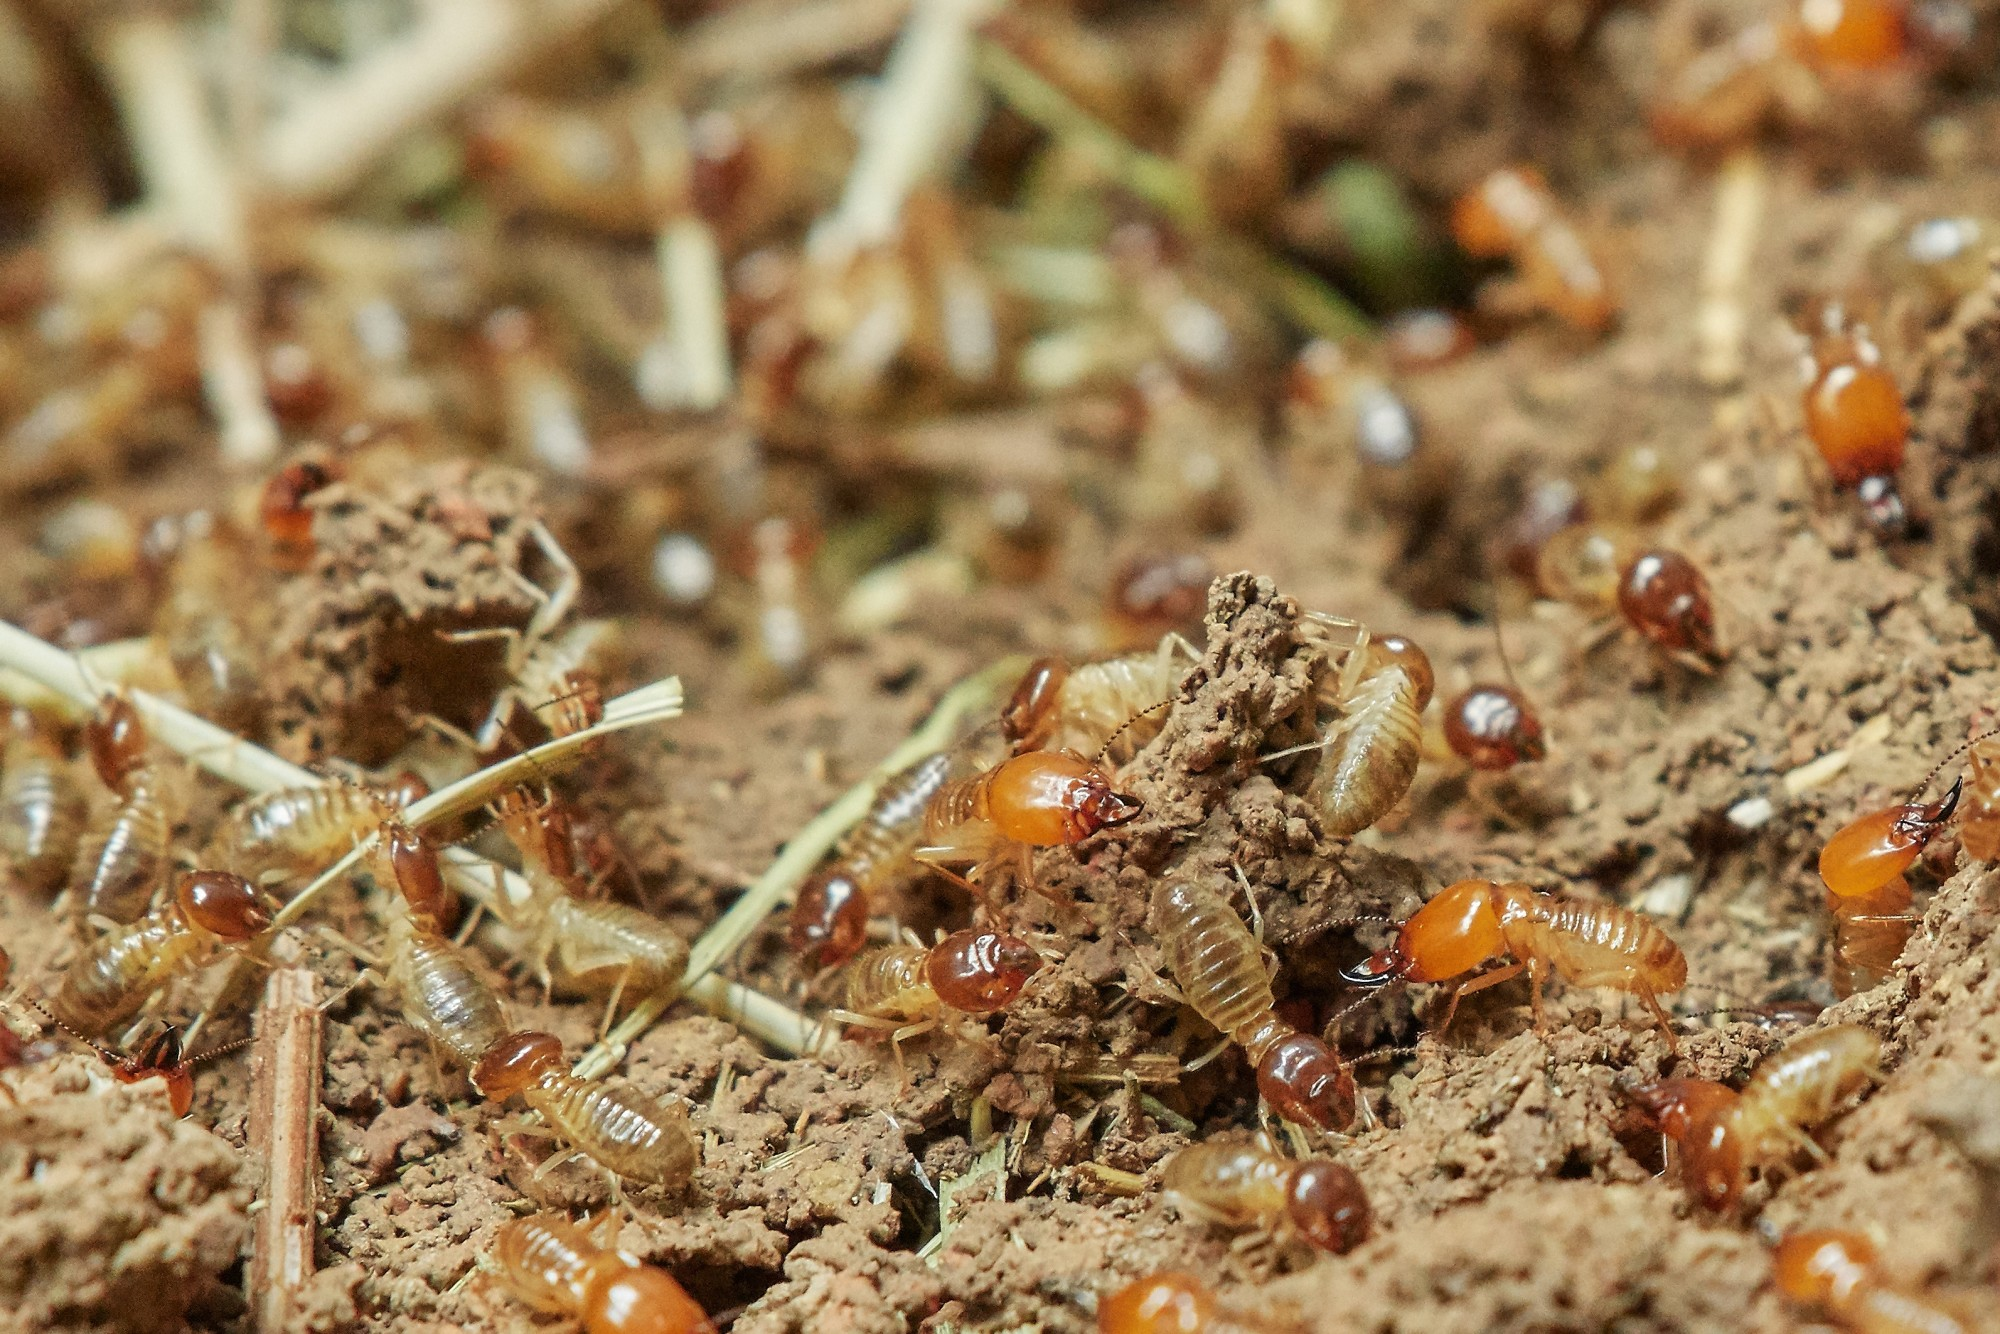 Flying Ants vs Flying Termites